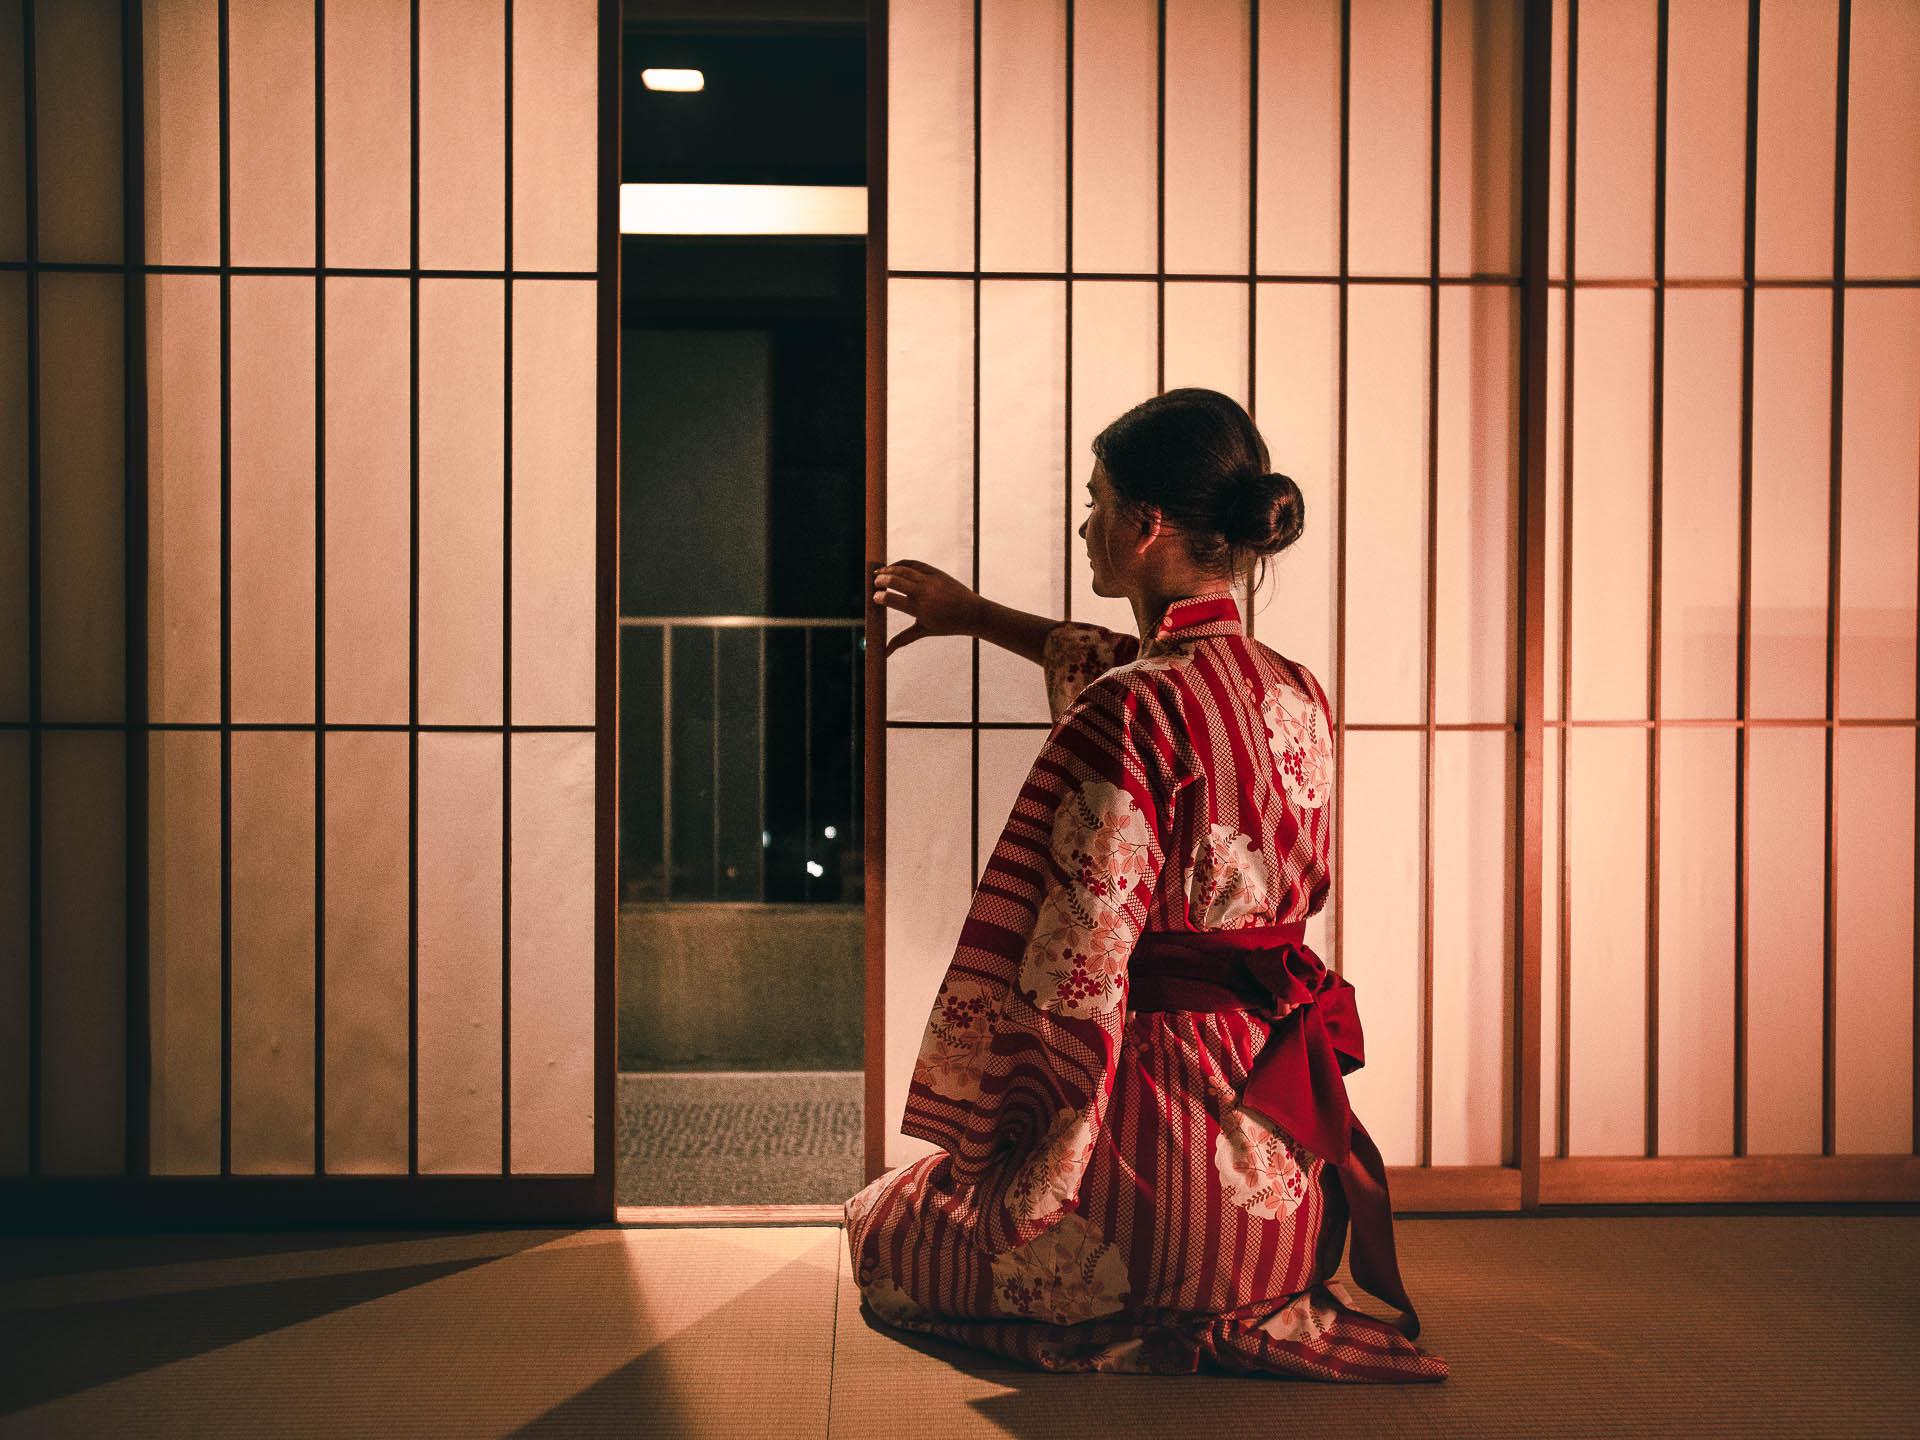 Visite Gero - Hida Takayama